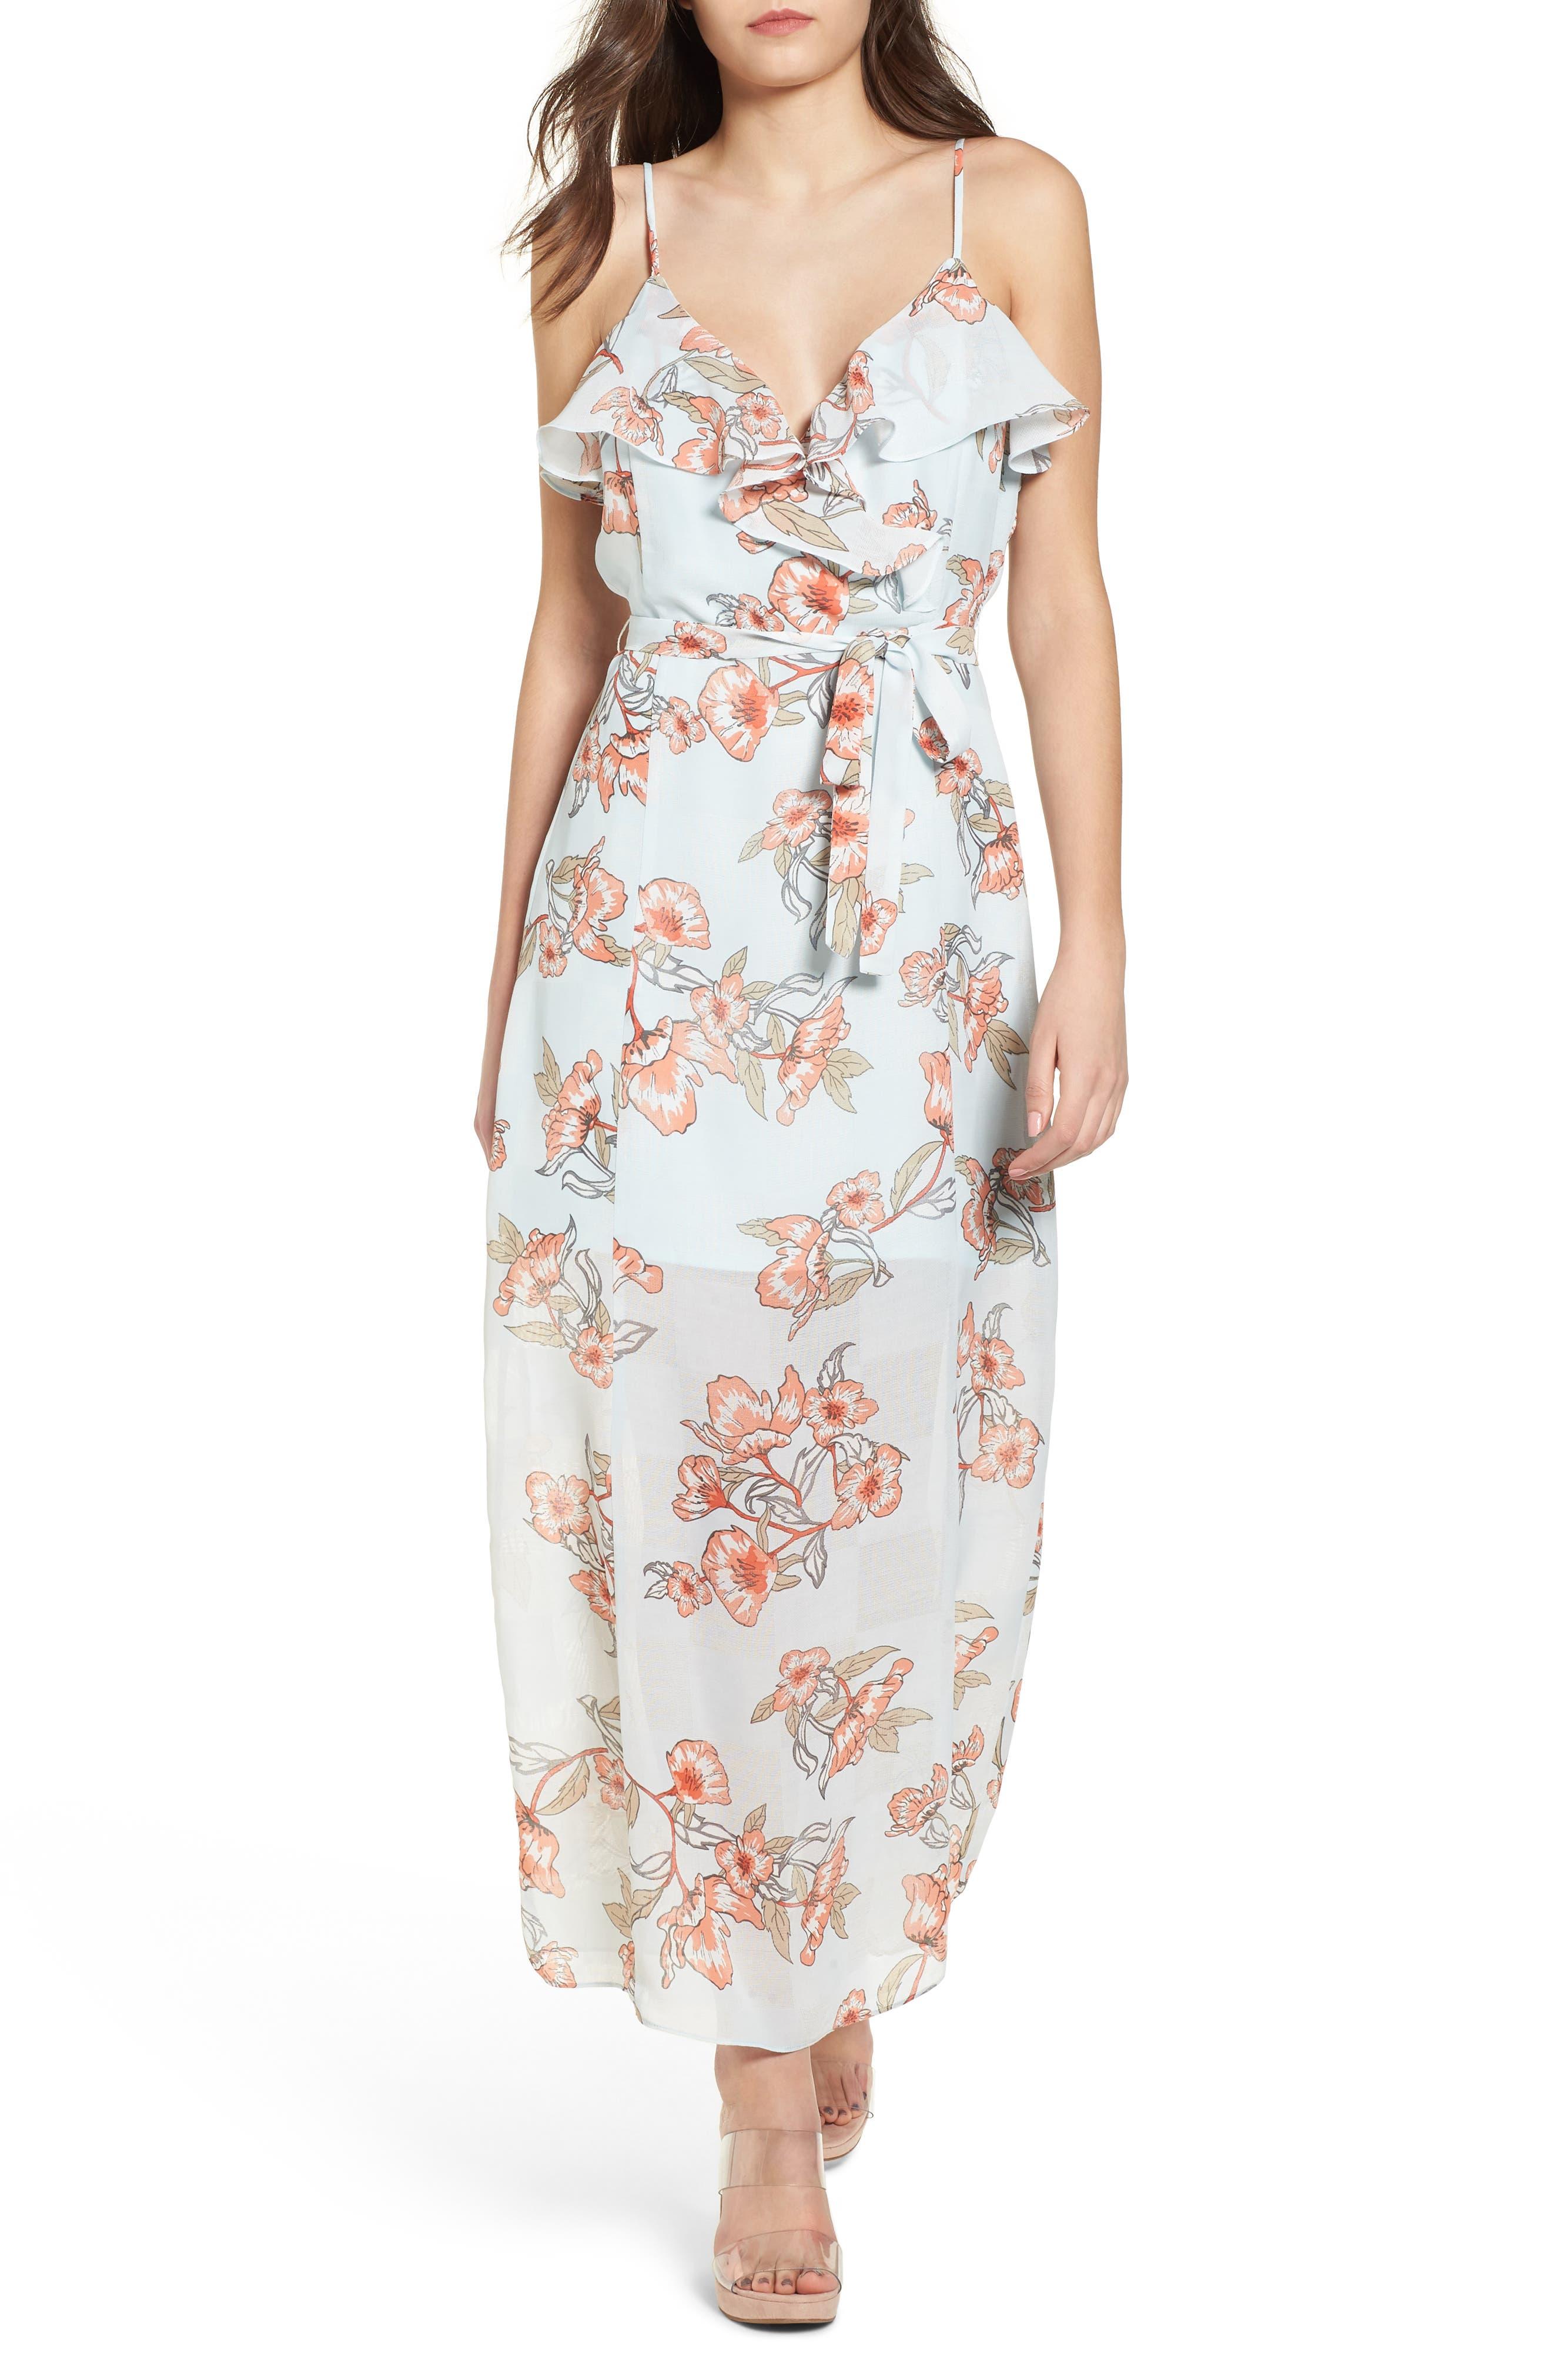 Alternate Image 1 Selected - J.O.A. Ruffle Maxi Dress